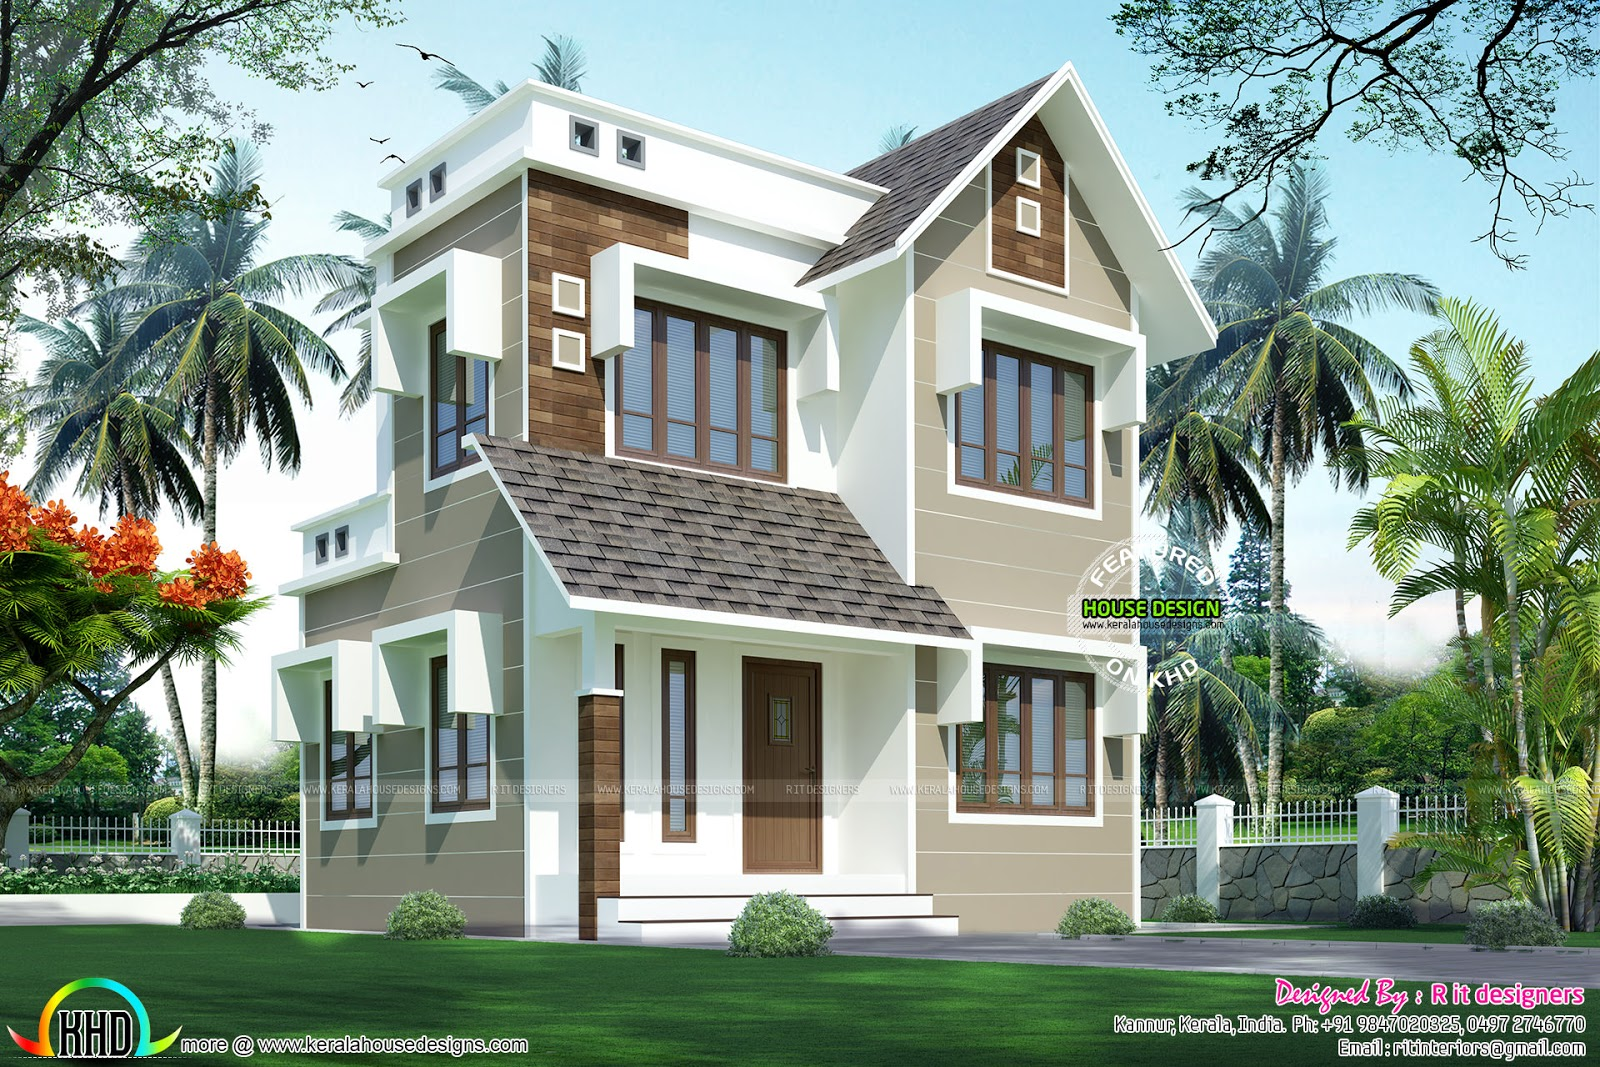 Home Plans In Kerala Below 15 Lakhs